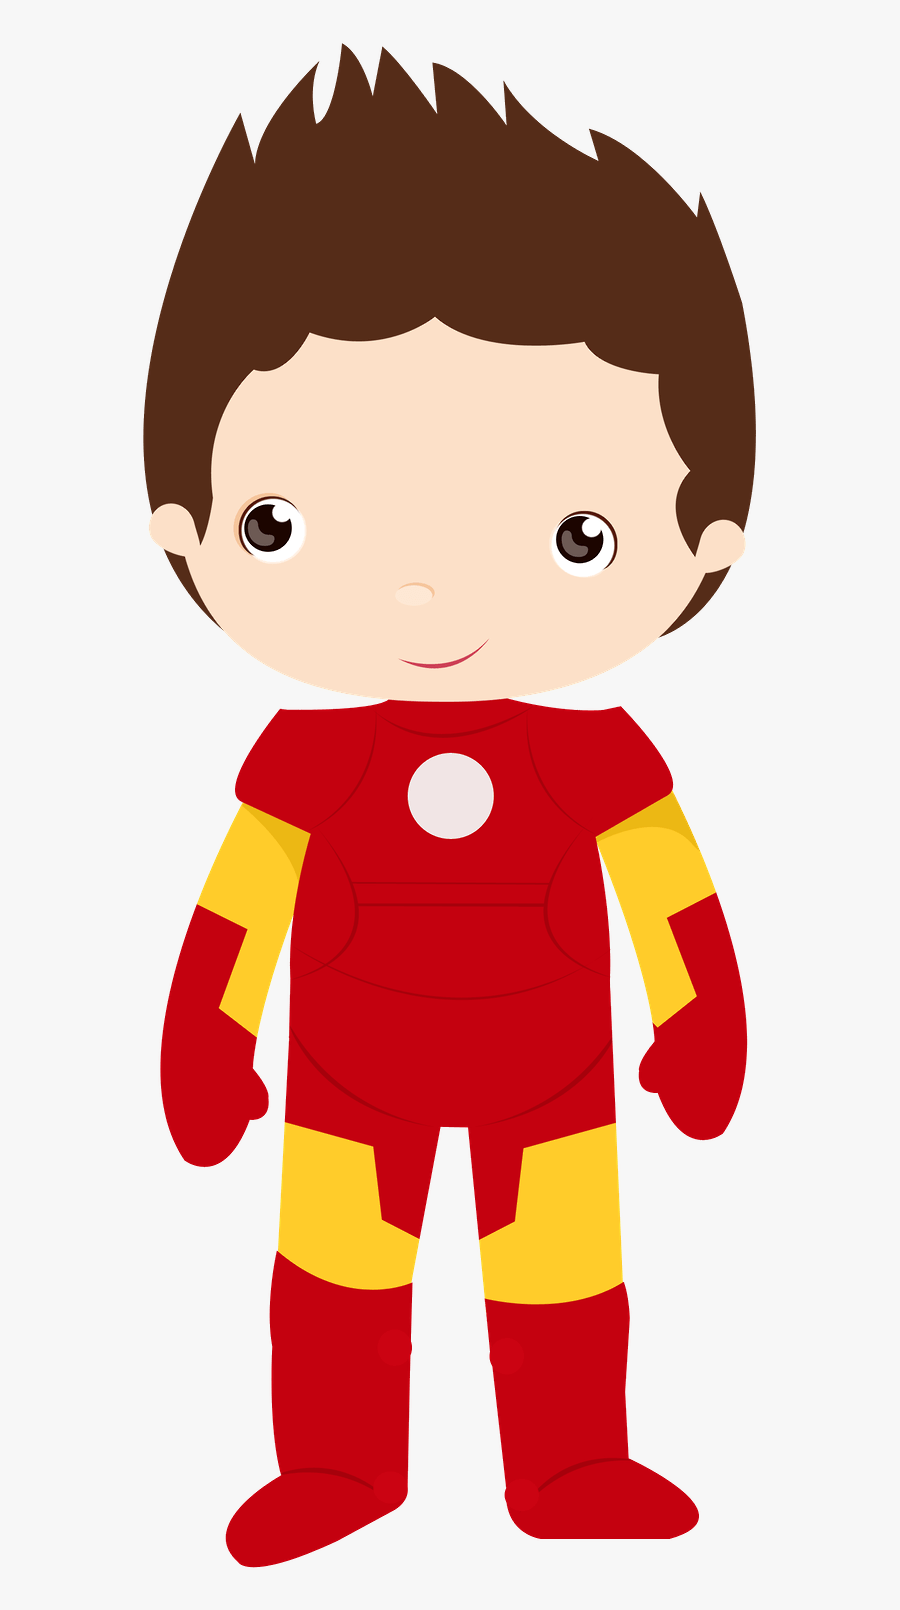 Cute Avengers Clipart - Iron Man Png Animado, Transparent Clipart